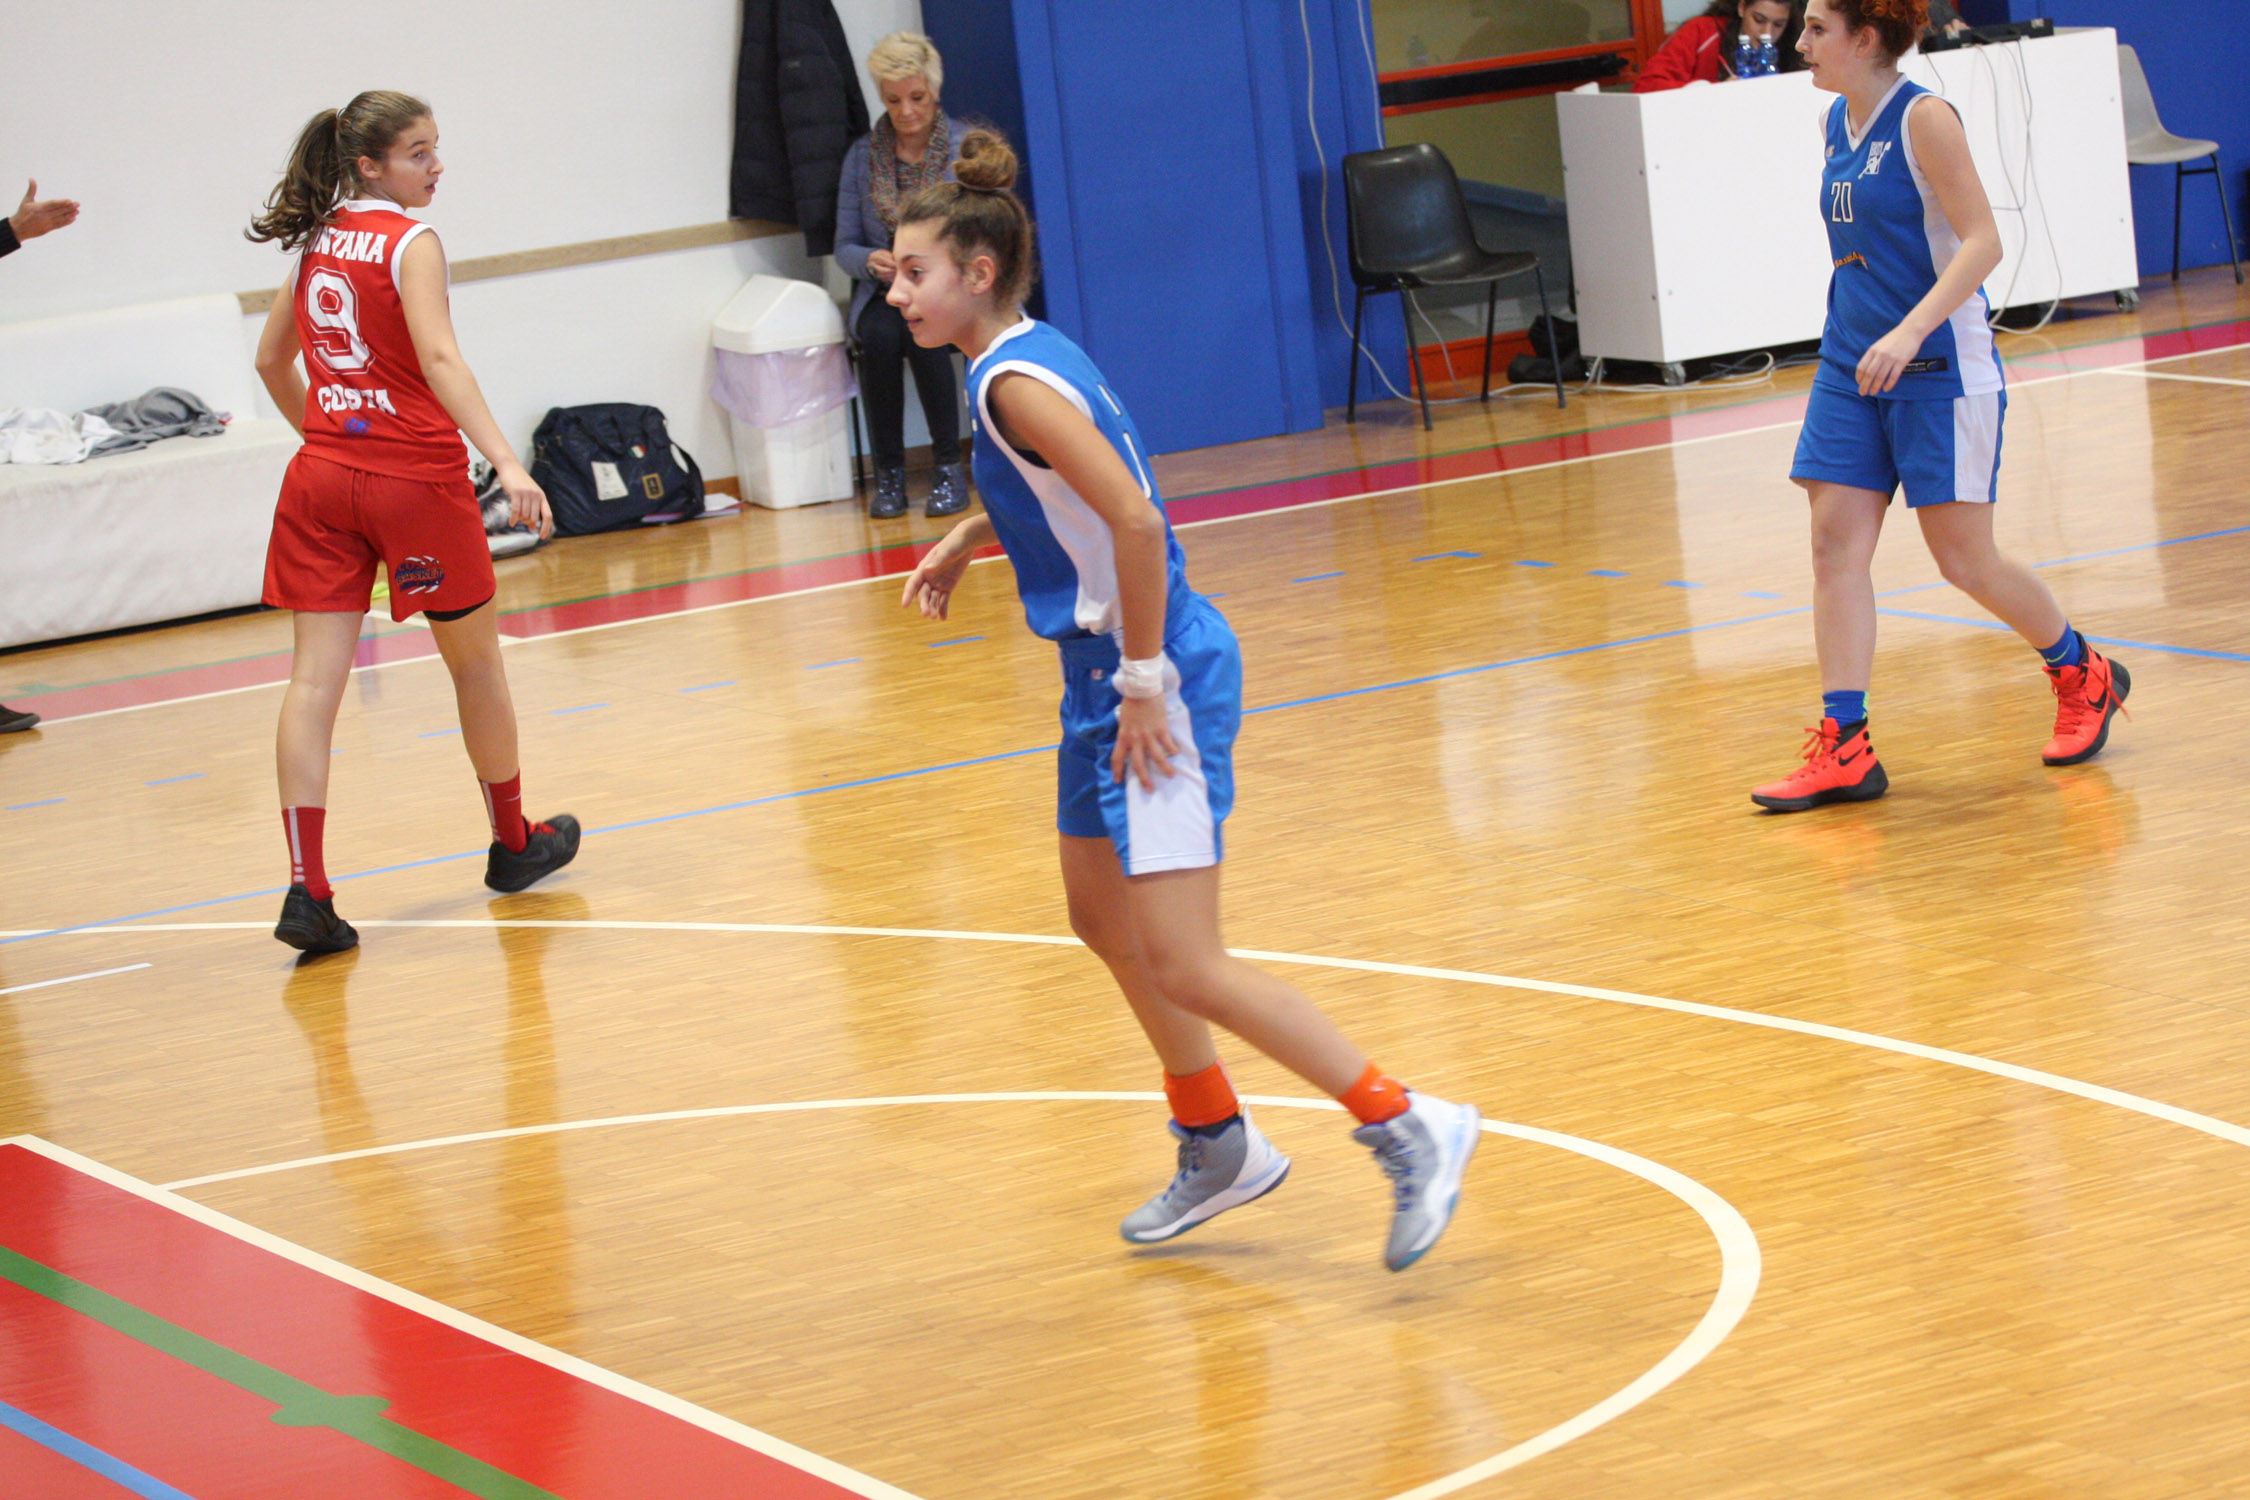 U16E - Costa Masnaga vs Baskettiamo Vittuone 2001 00006.jpg